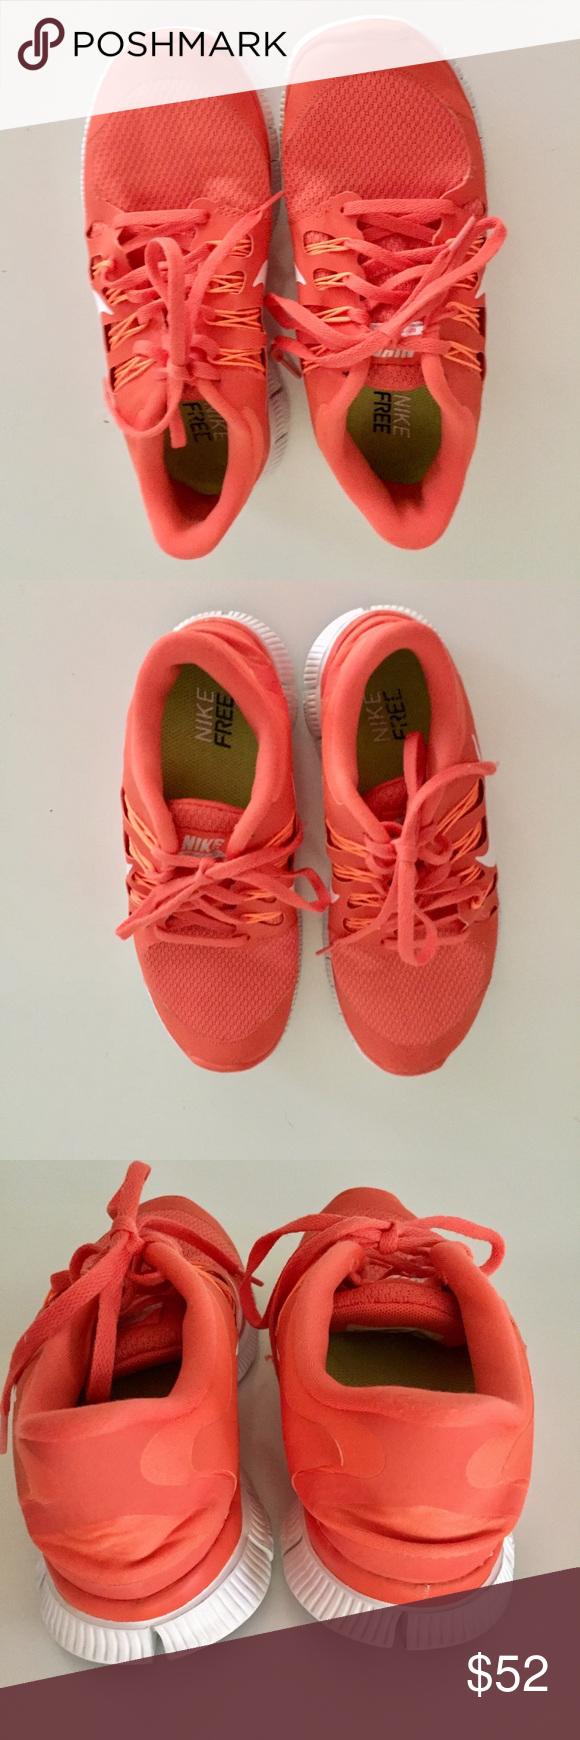 Nike Free 5.0 neon neonorange sneakers Schuhe Turnschuhe